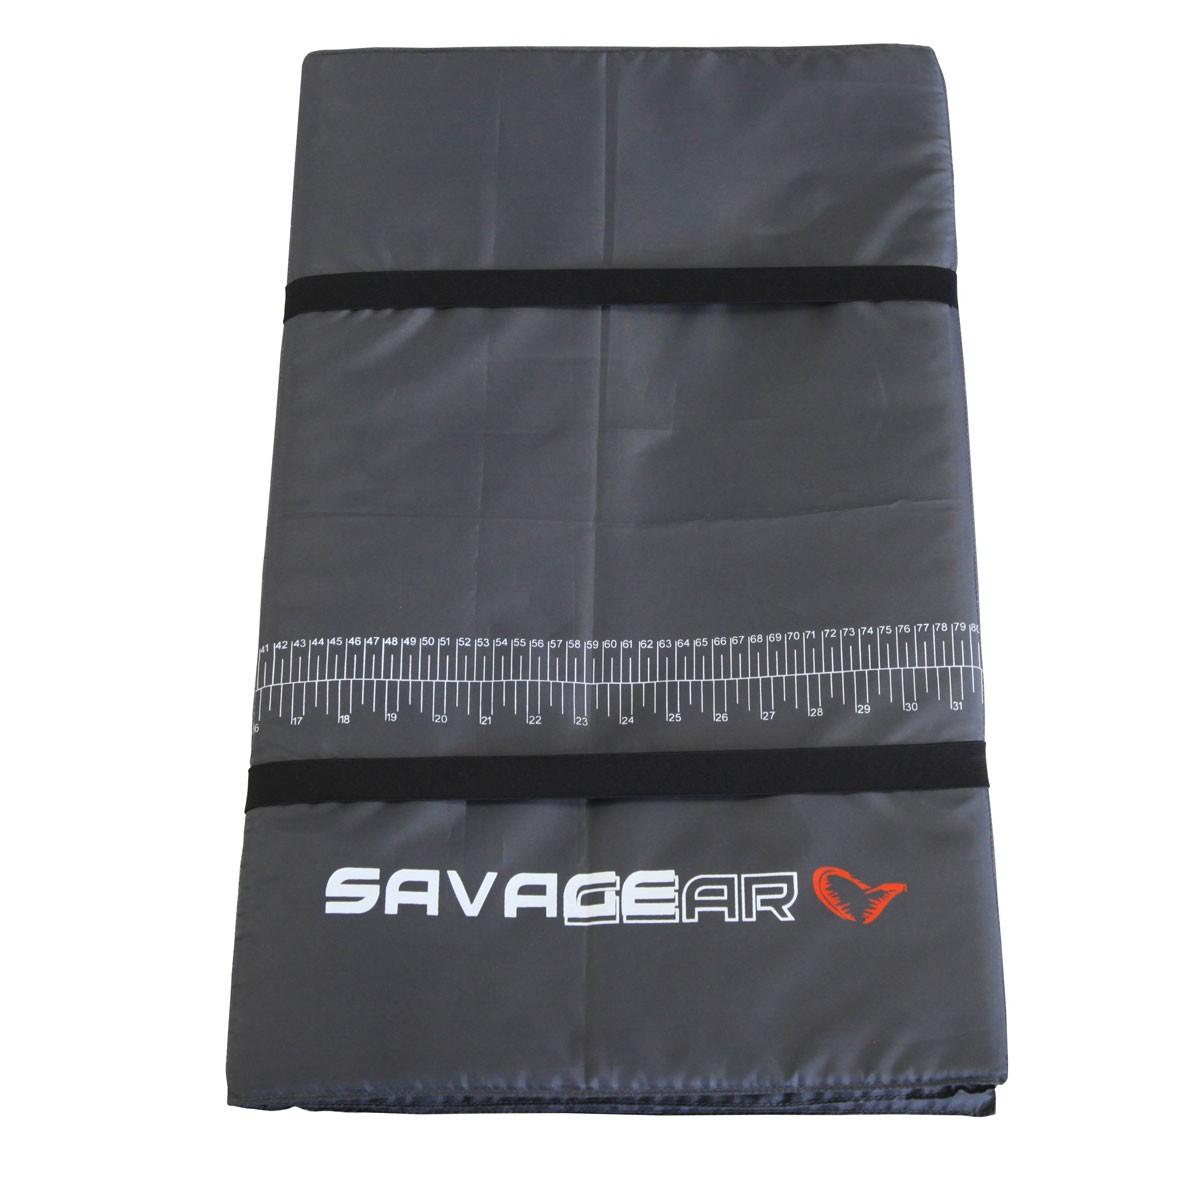 Savage Gear Un Hooking Mat The Tackle Shack